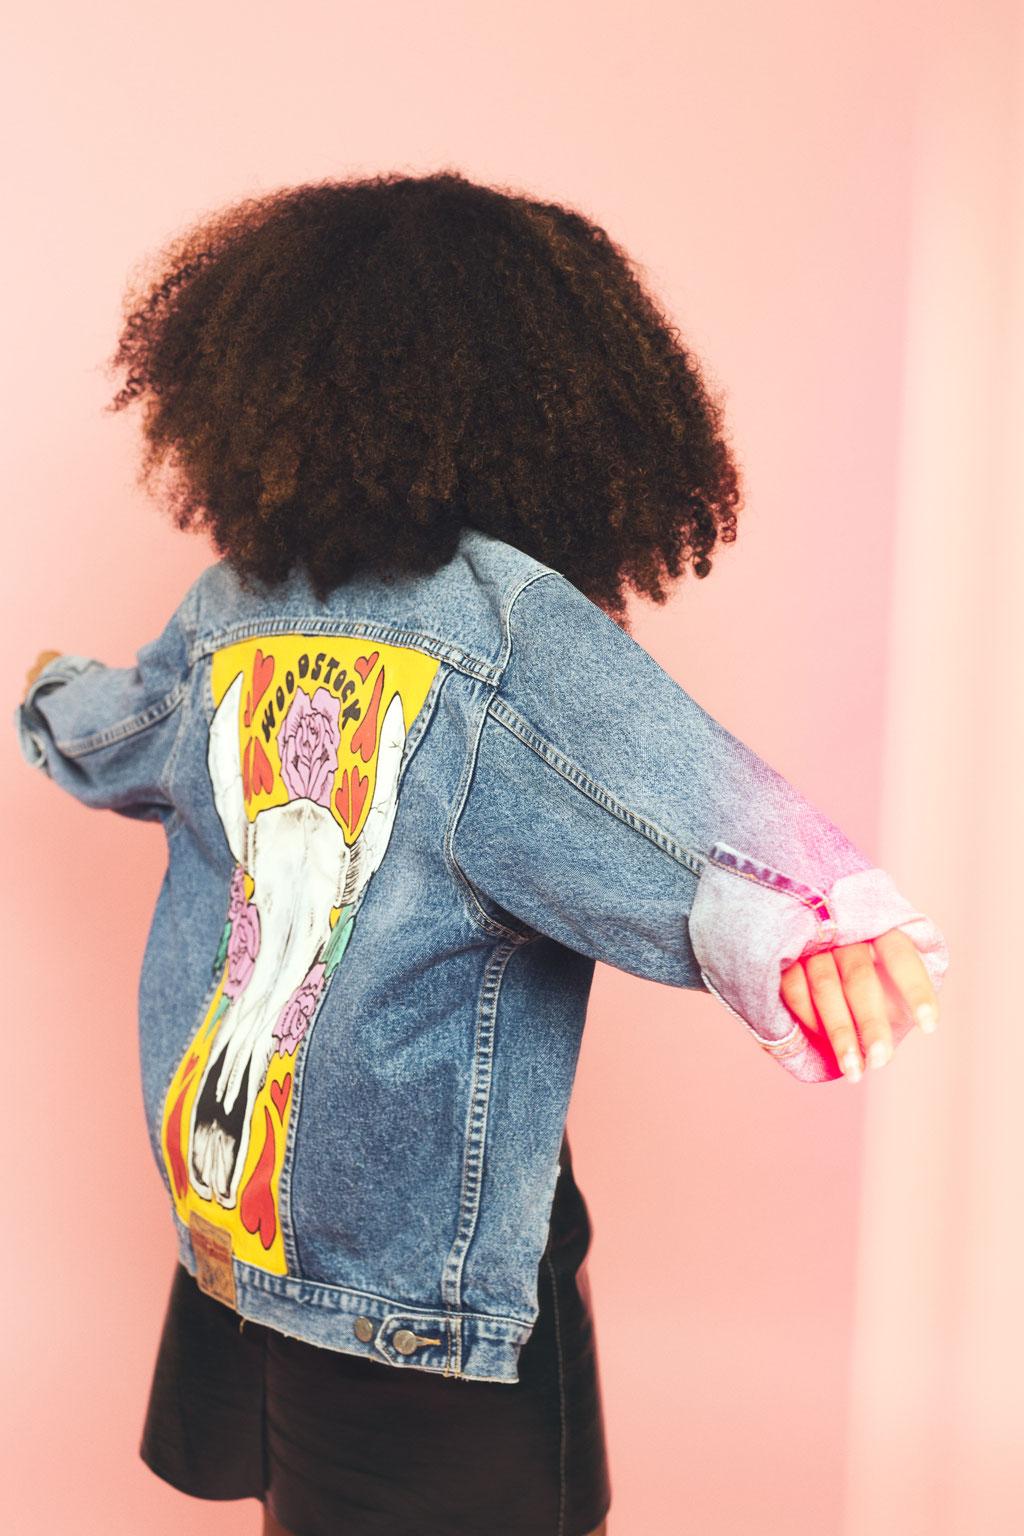 Jackets - The Dutch Rebel. Photography - Landa Penders. Styling - Studio XO. Make-up & Hair - Mahzad Mirzaei. Models - Esther Breedenbach & Chelsey R.